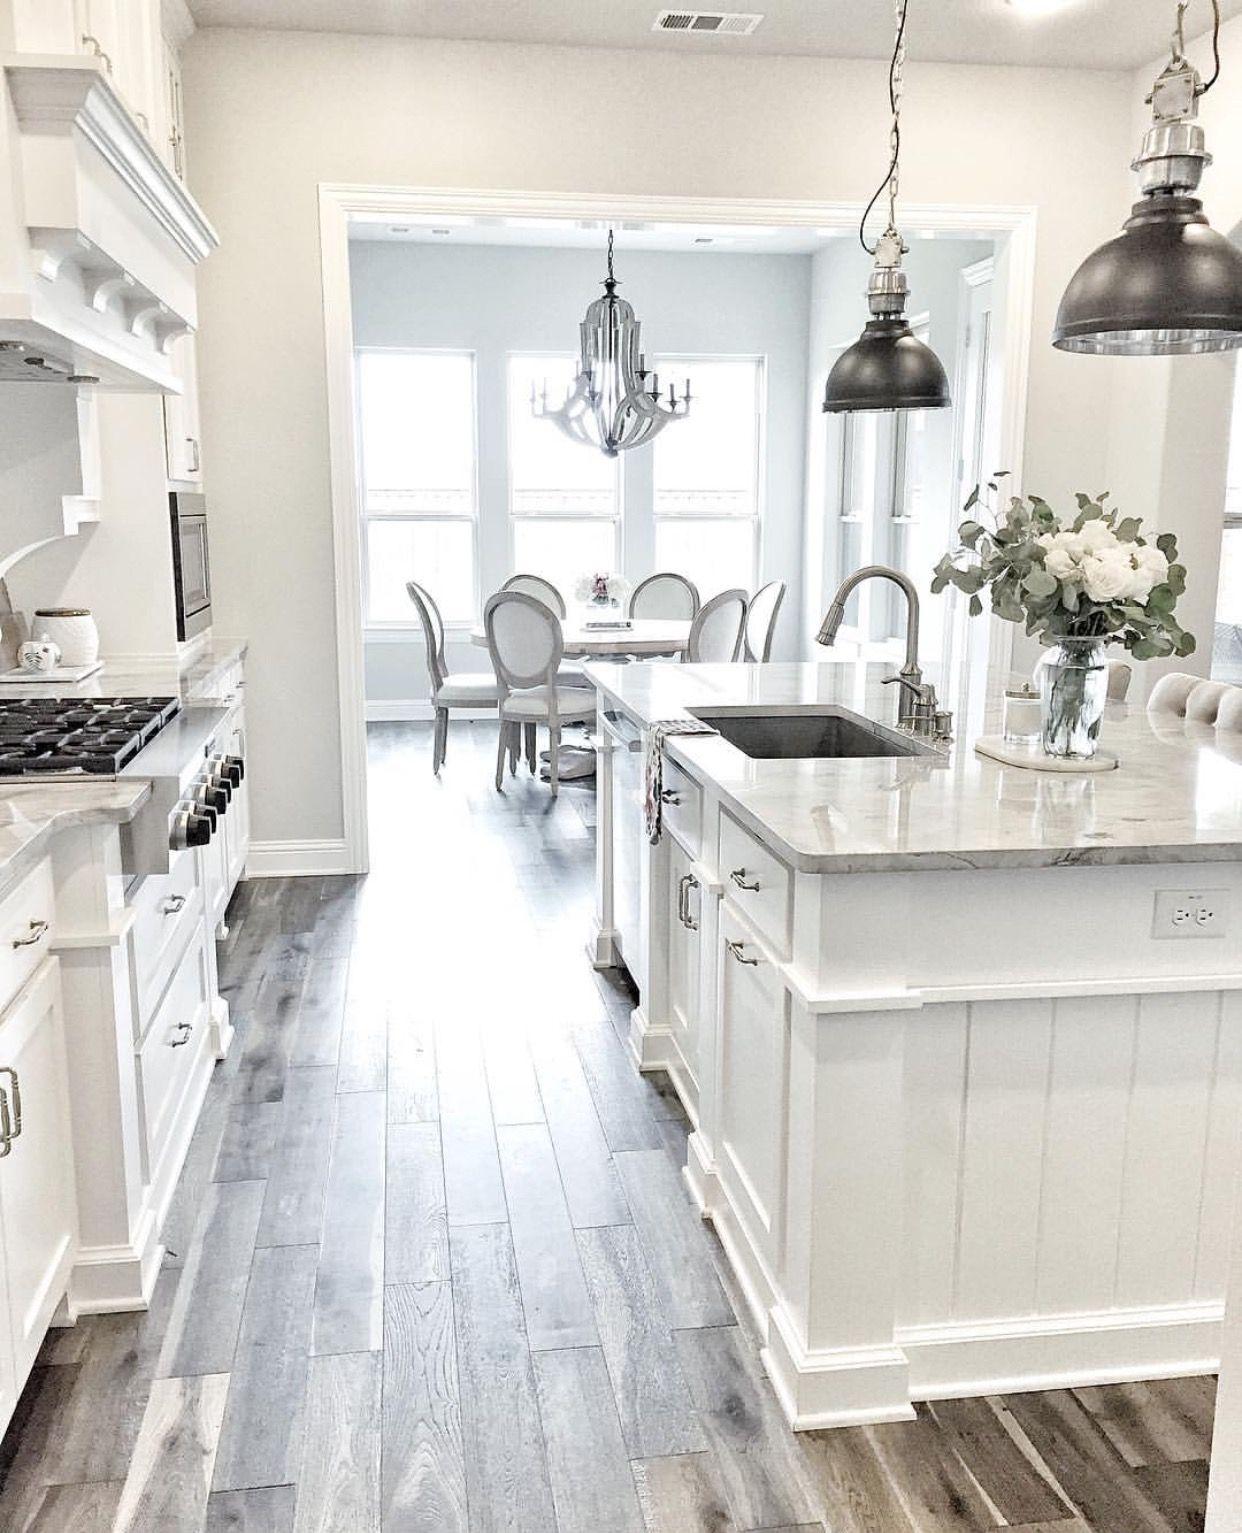 Pinterest Theamyjean White Kitchen Design Kitchen Design Kitchen Cabinet Design